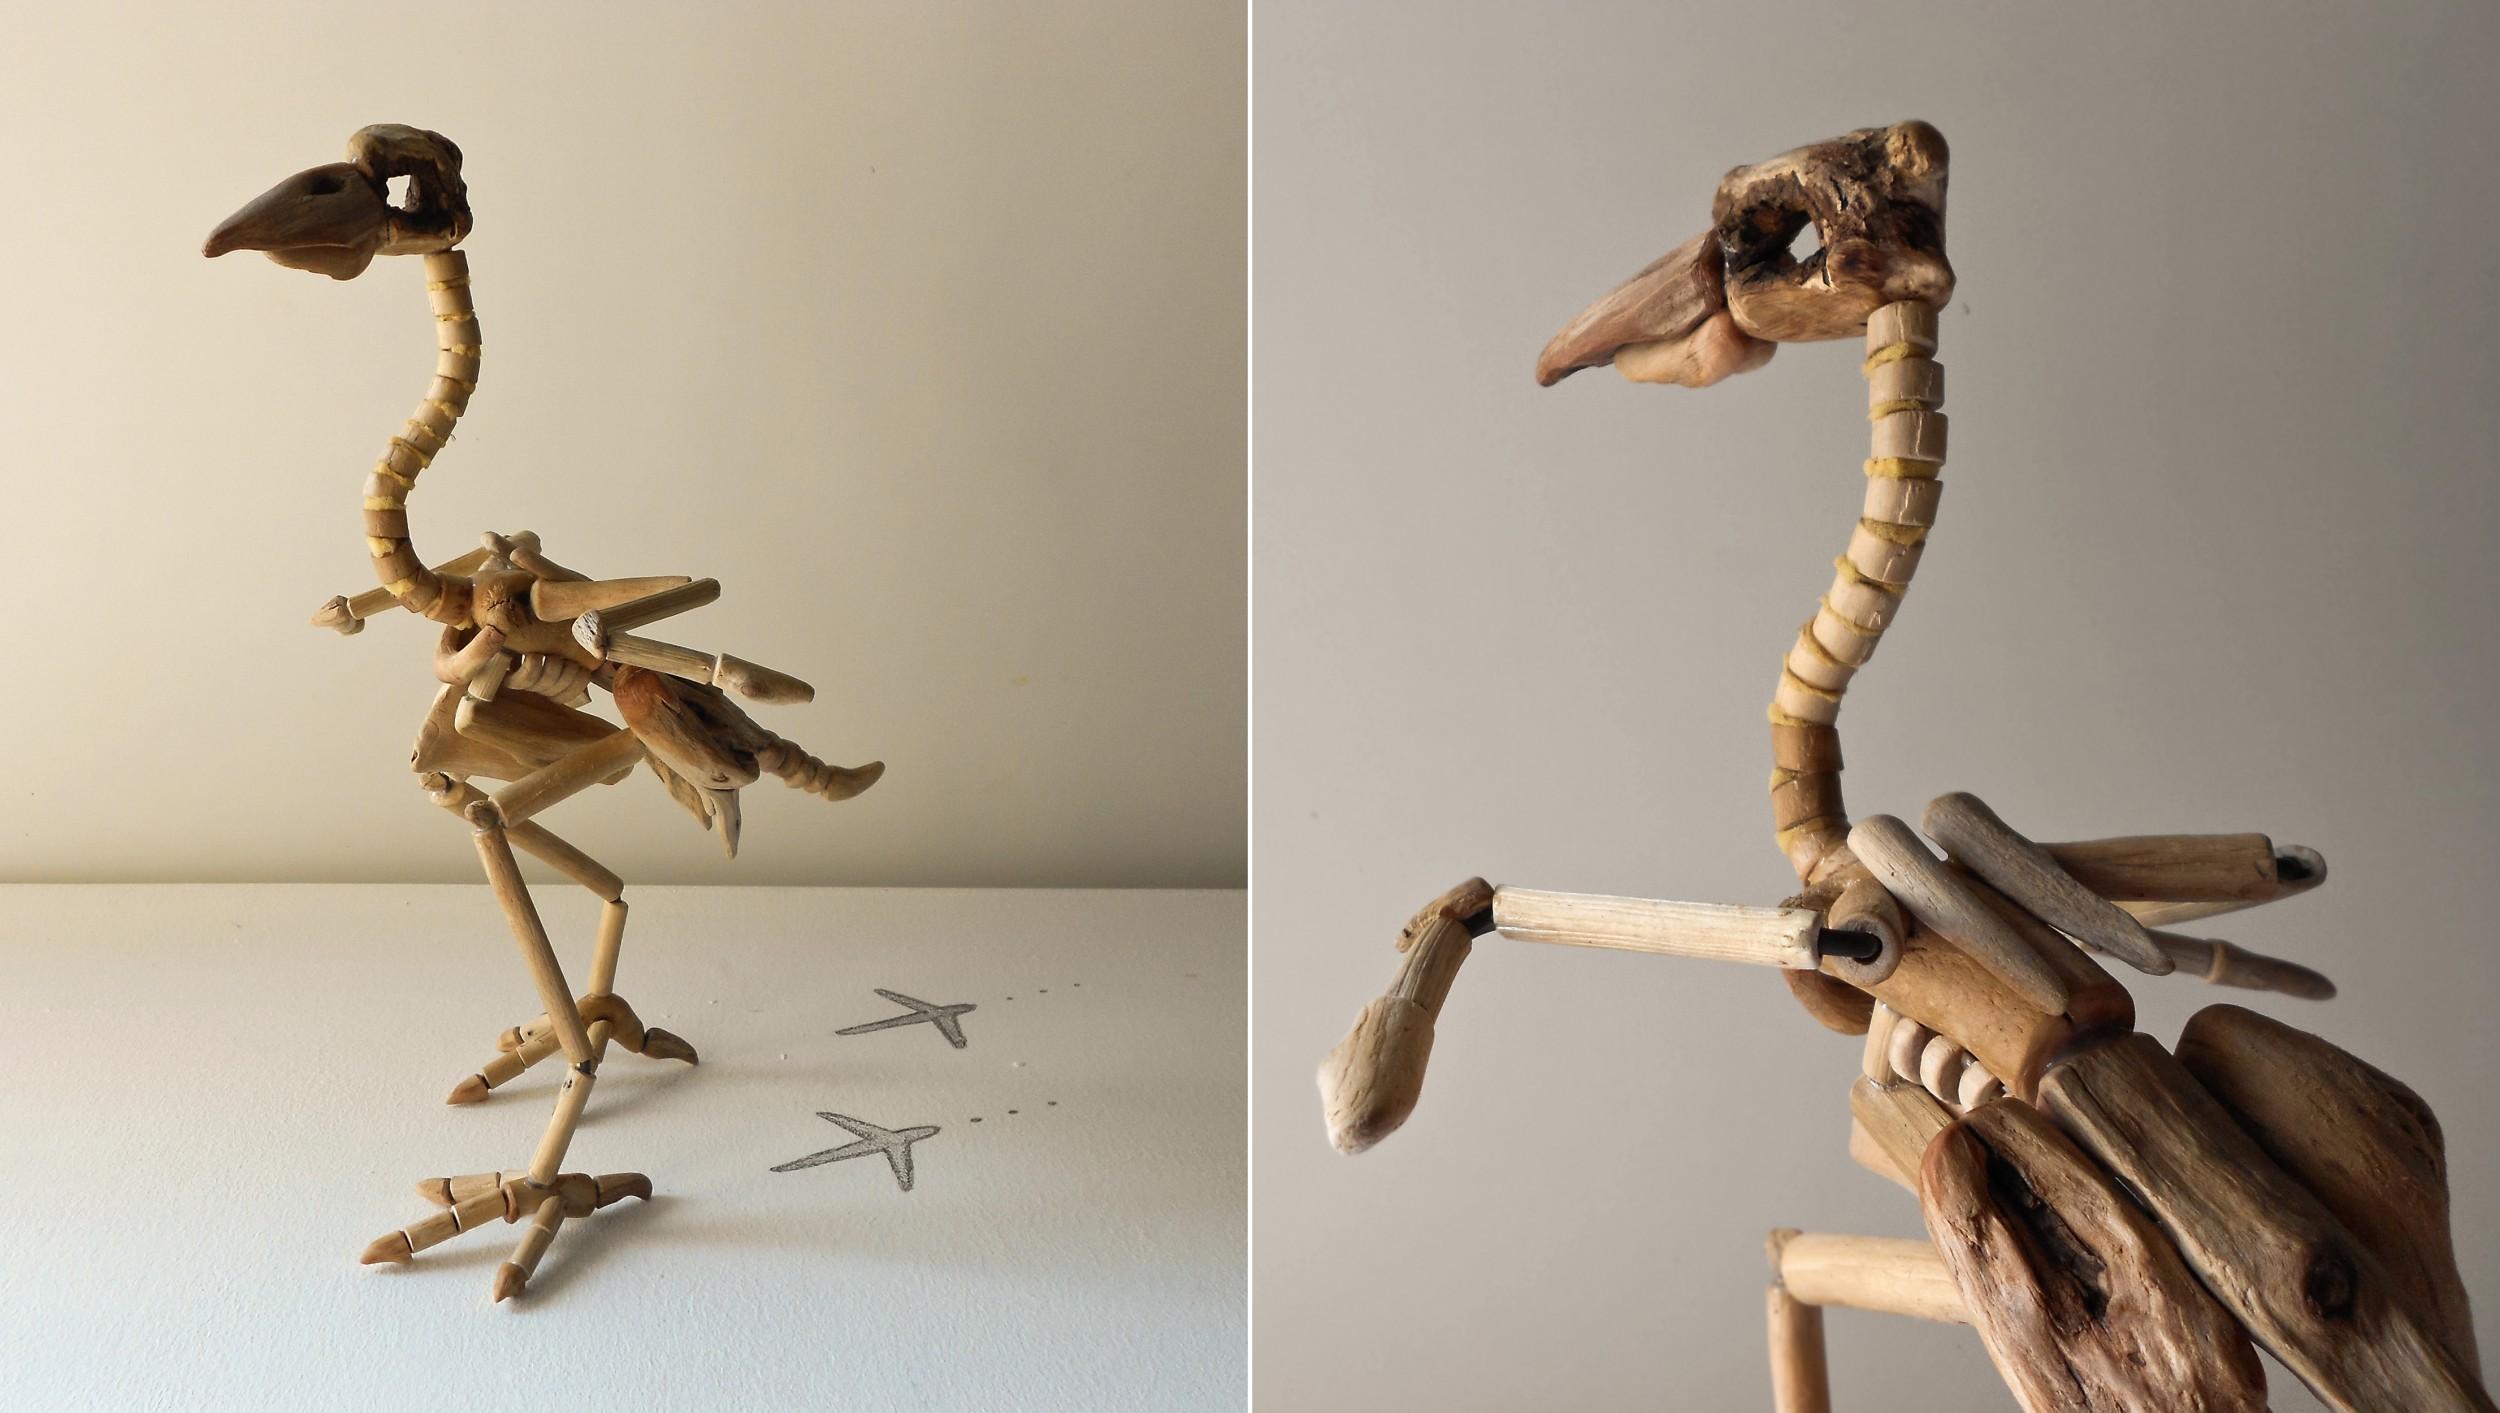 giovanni_longo_wood_sculptures-02